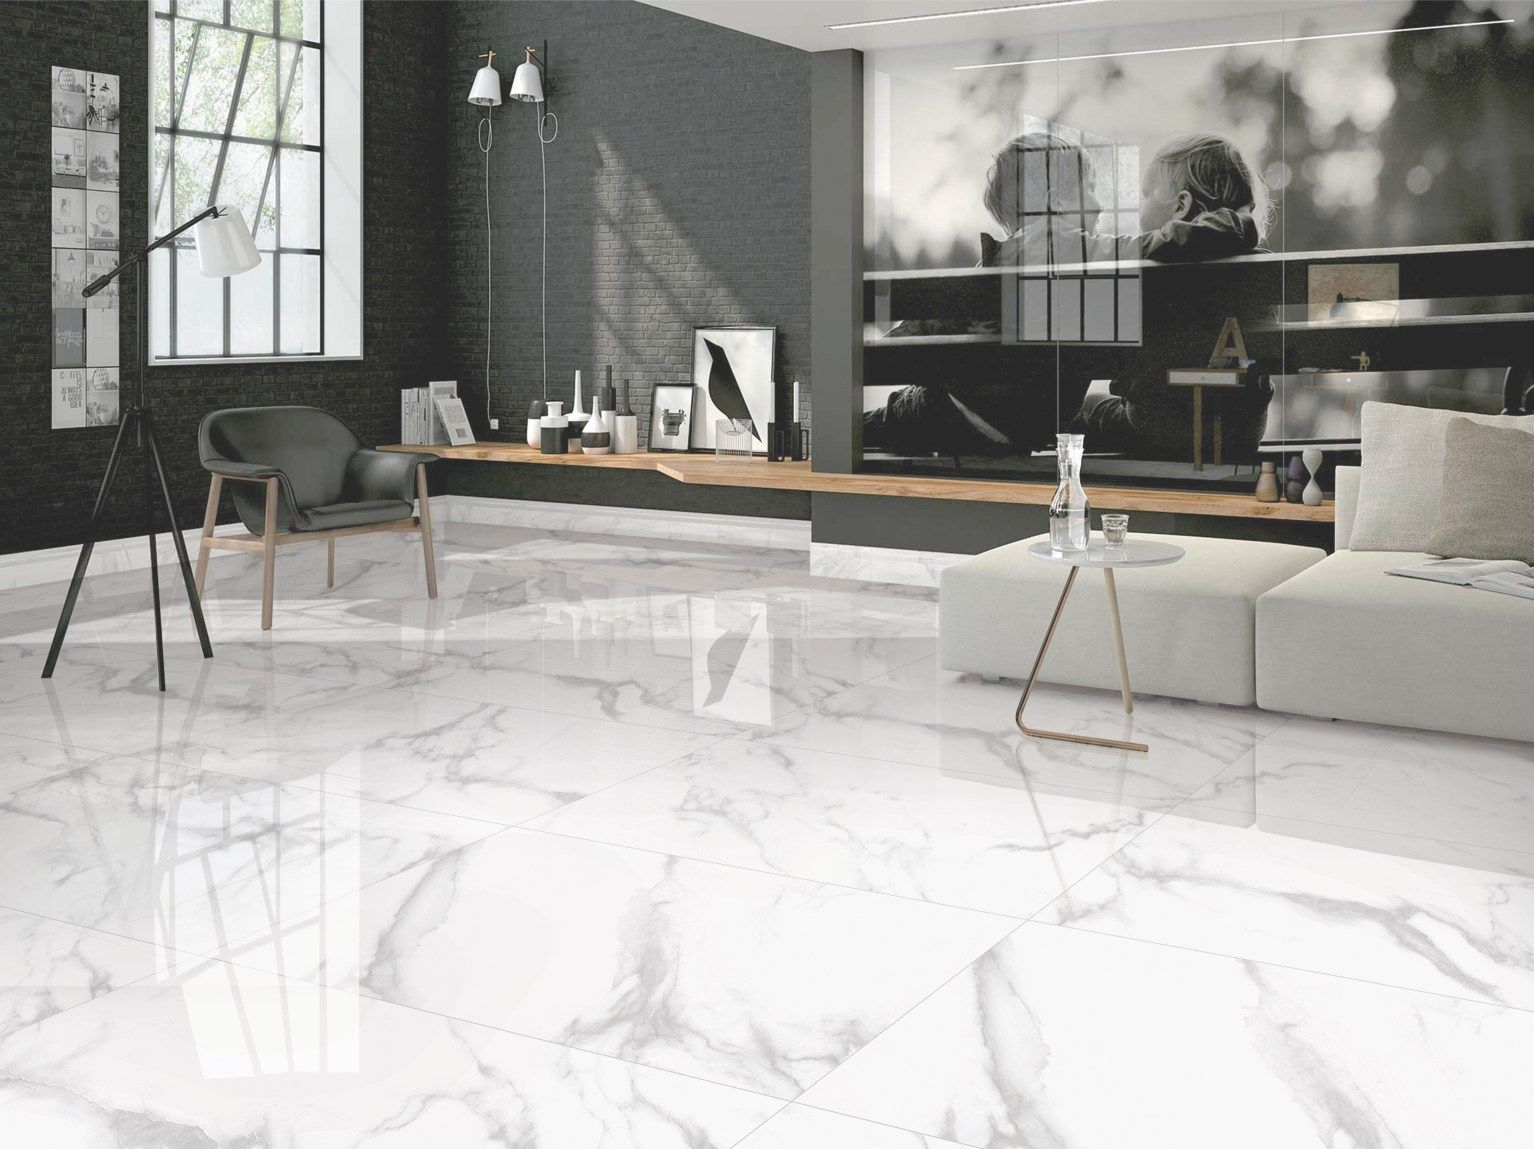 Marble Flooring Orient Bell Tiles Statuario Marble Floor Tiles - Decornish  [dot] com | Tile floor living room, Marble tile floor, Living room flooring